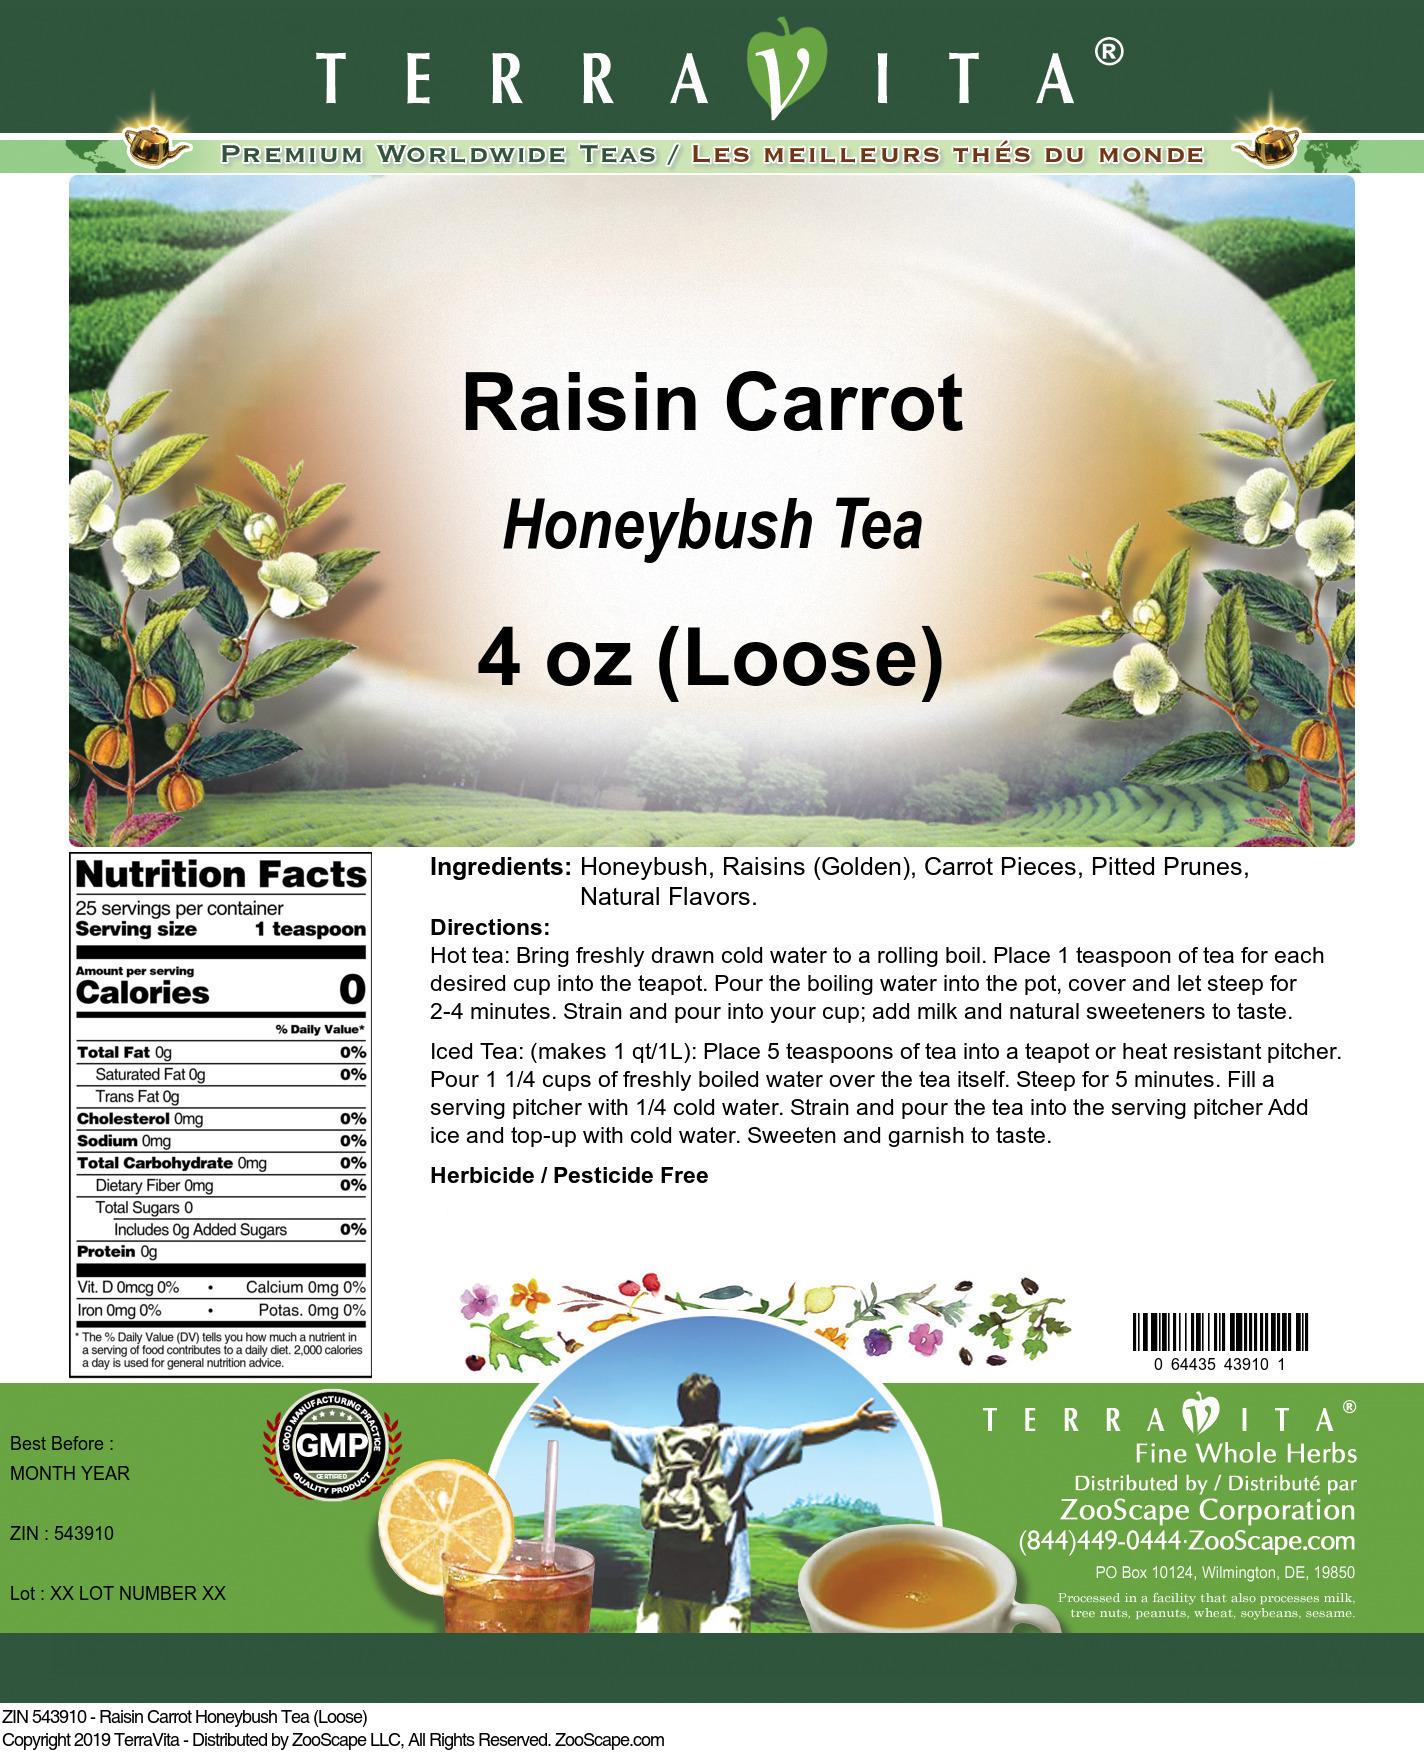 Raisin Carrot Honeybush Tea (Loose)